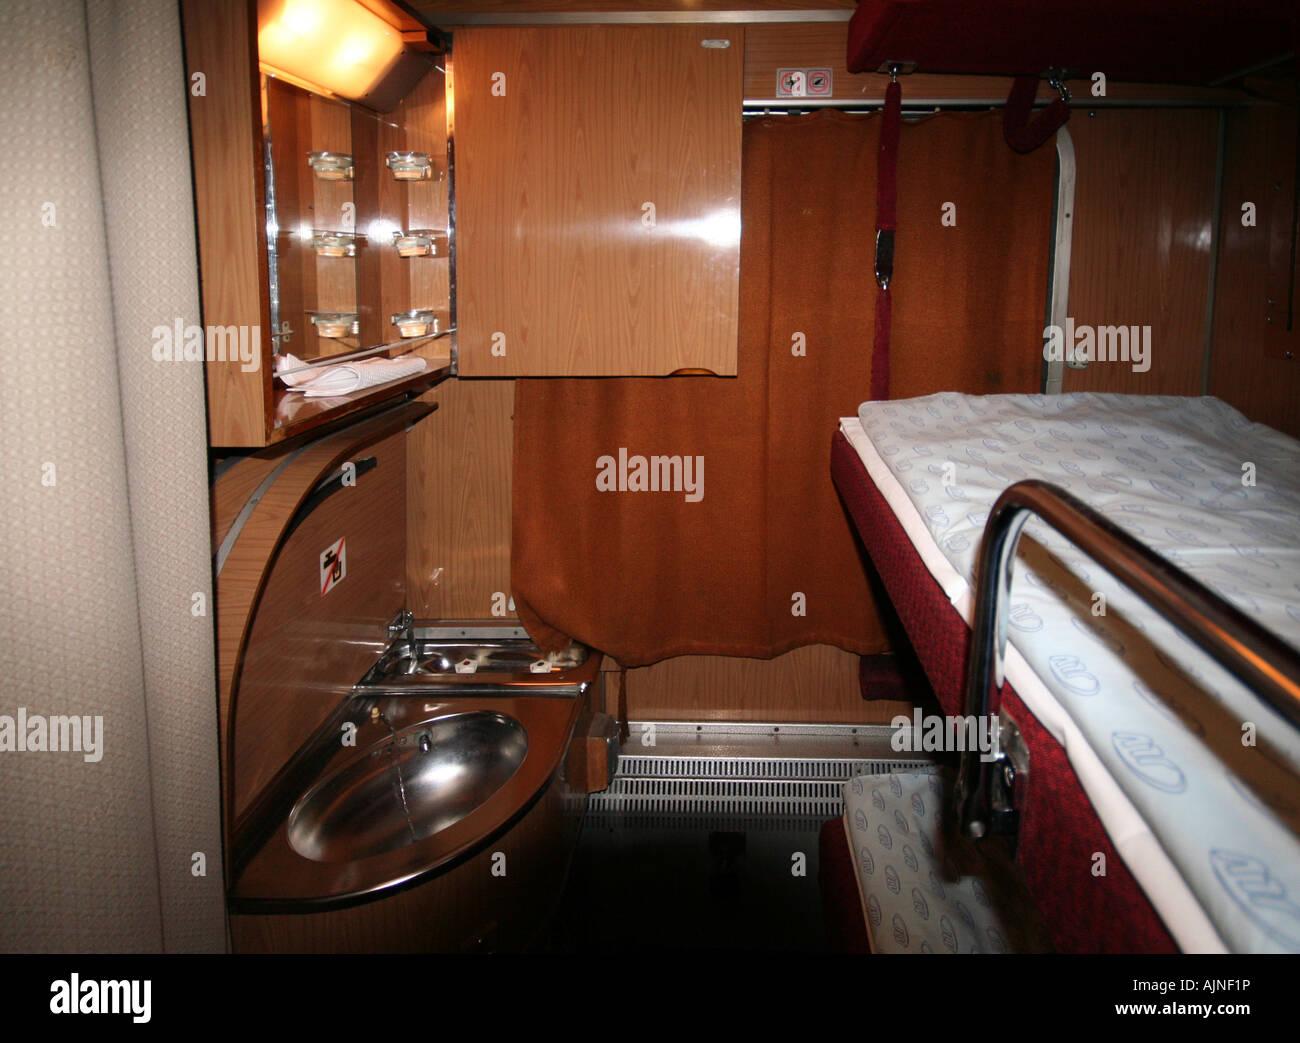 Bunk Beds Sleeper Carriage Prague To Krakow Overnight Train Stock